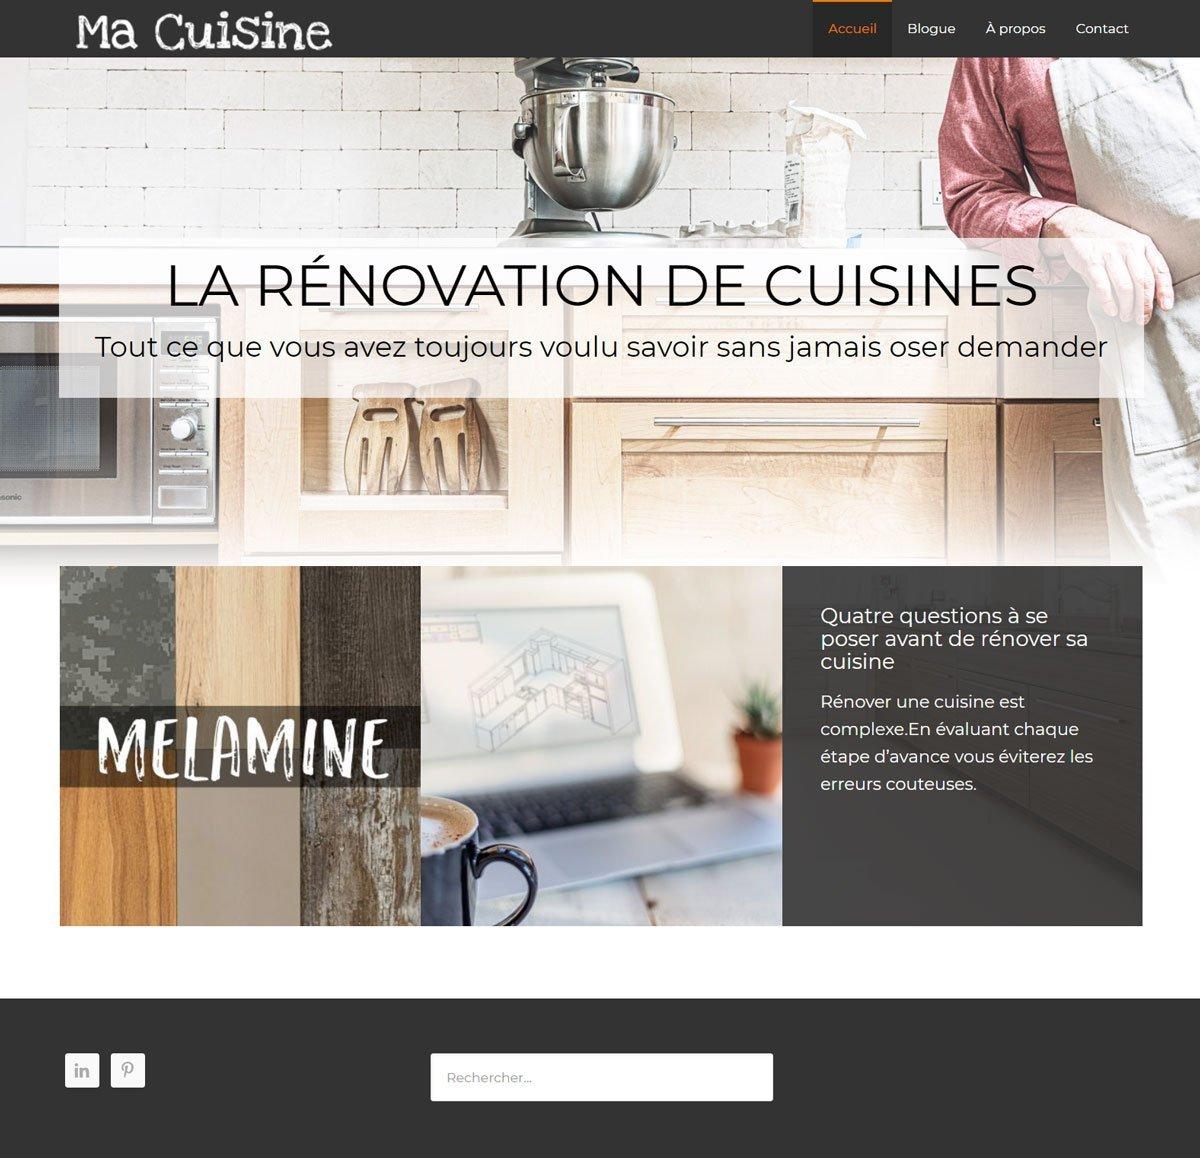 Ma Cuisine Blog Design